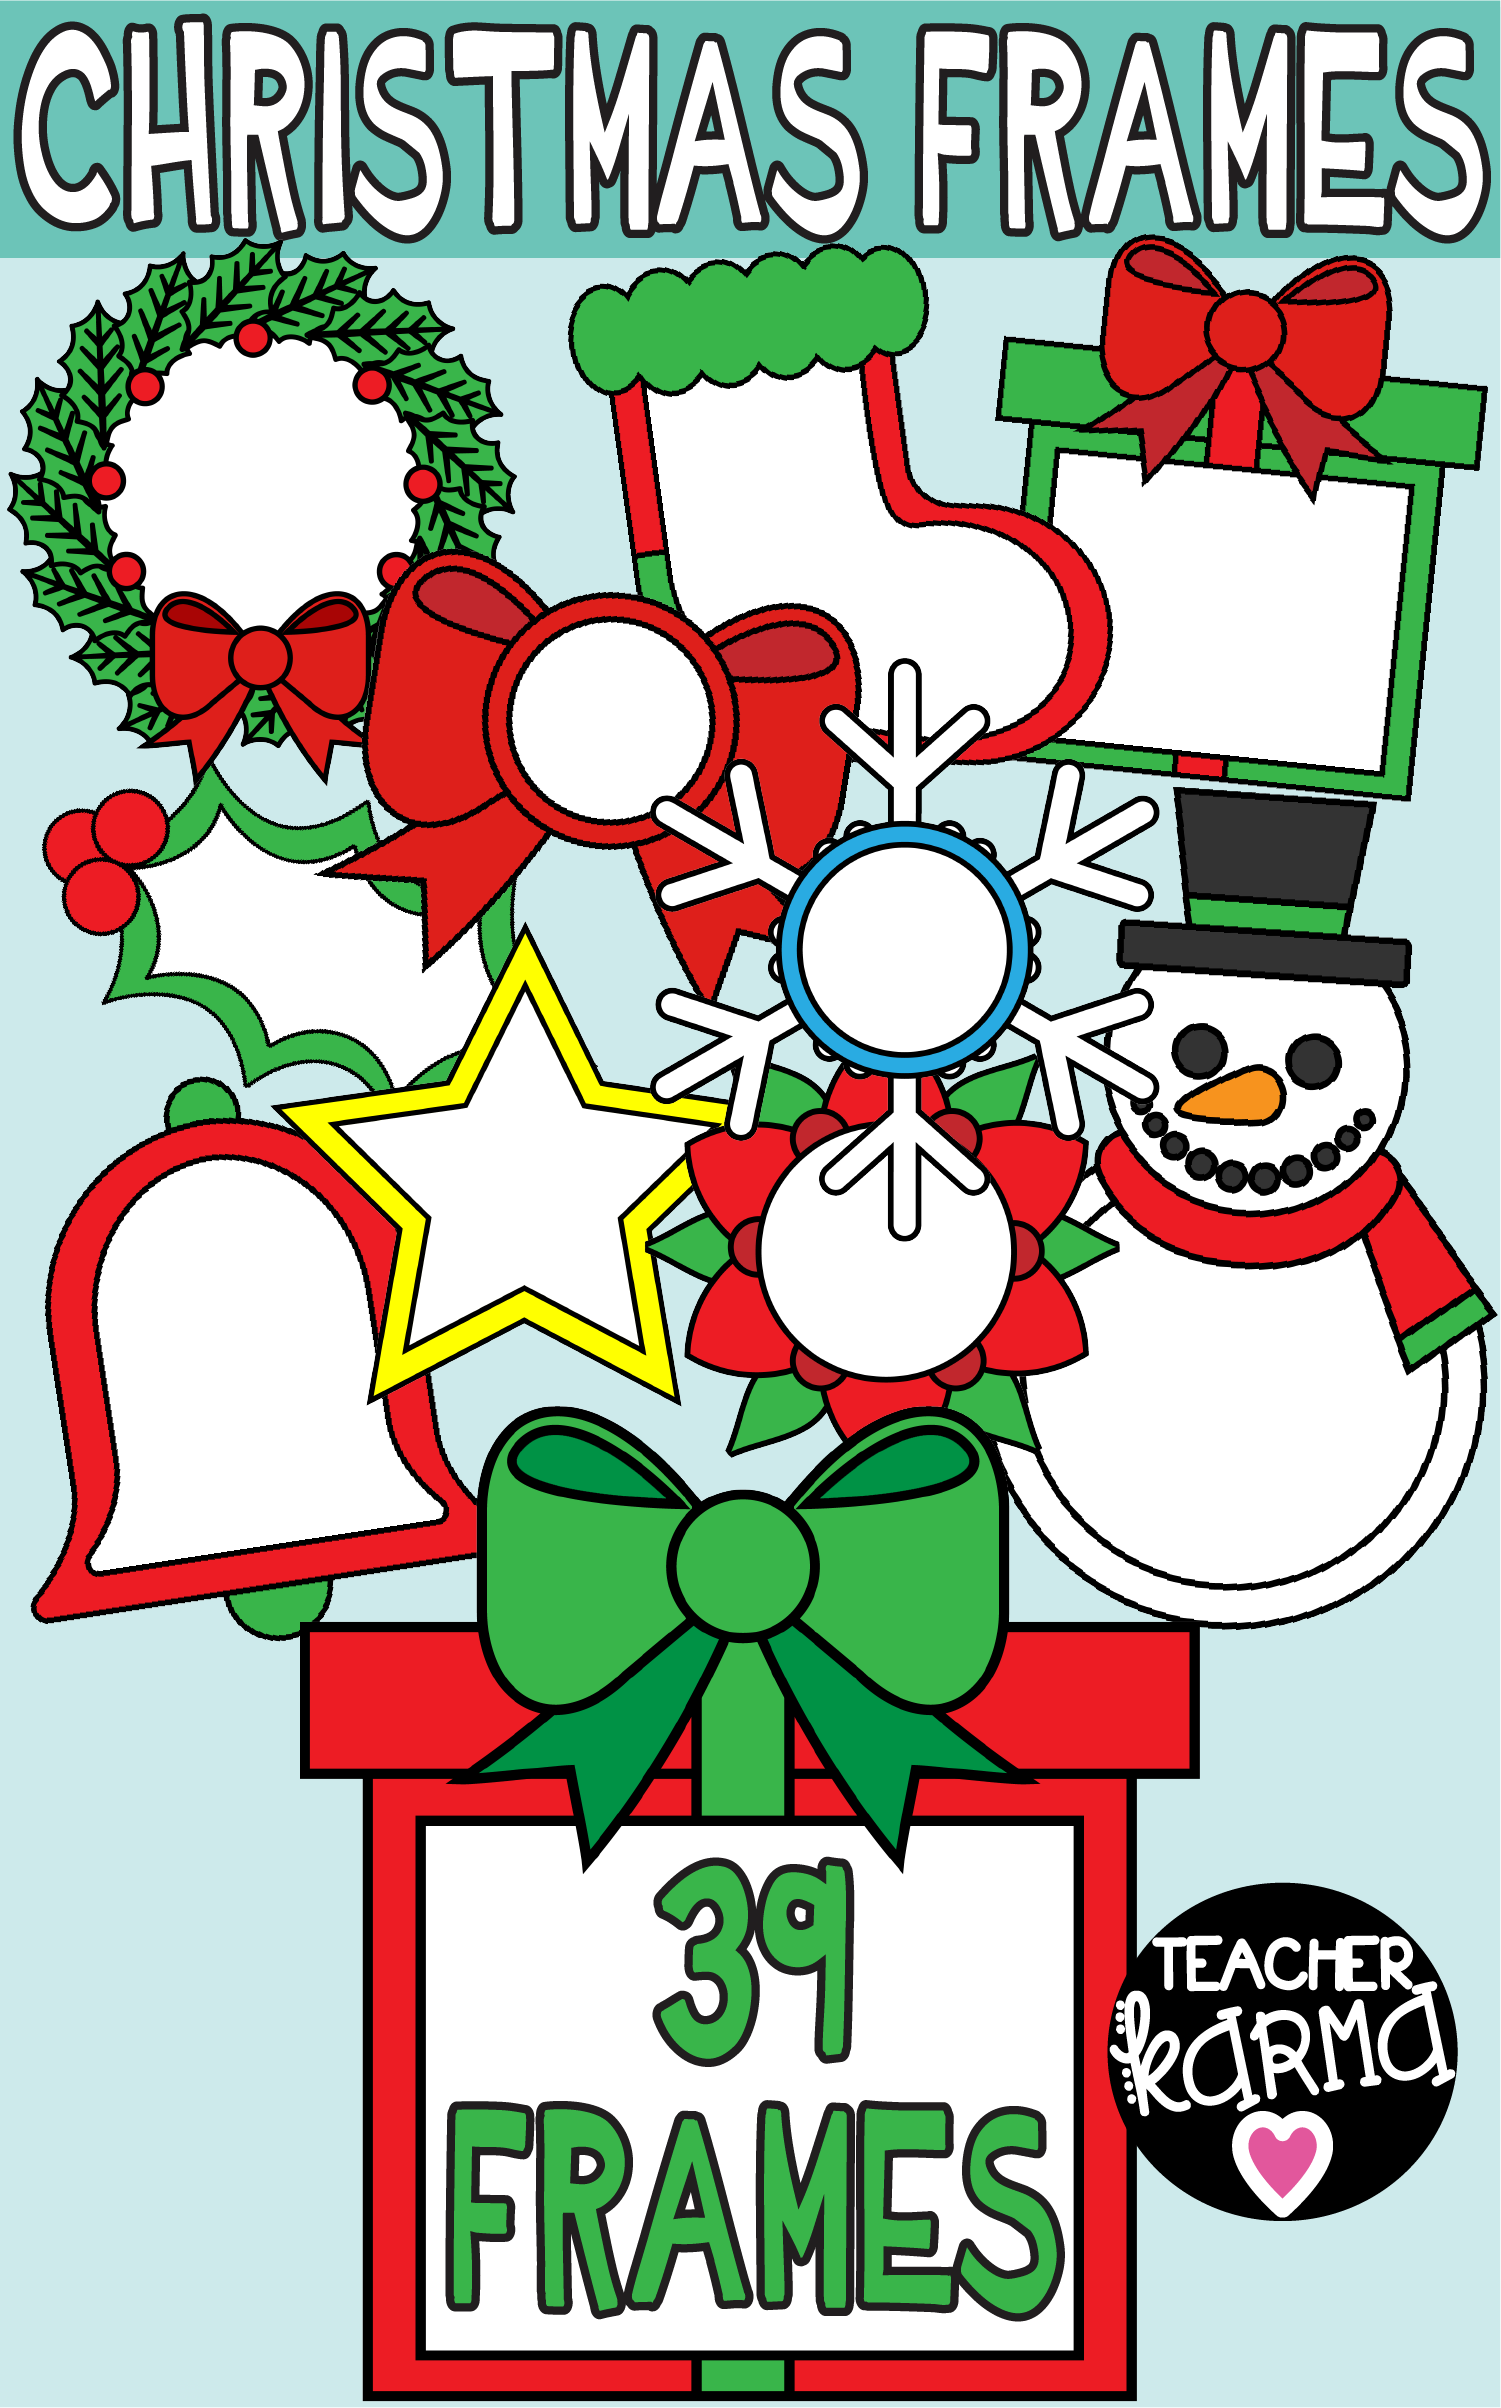 Christmas Frames Clipart, Holiday Borders.